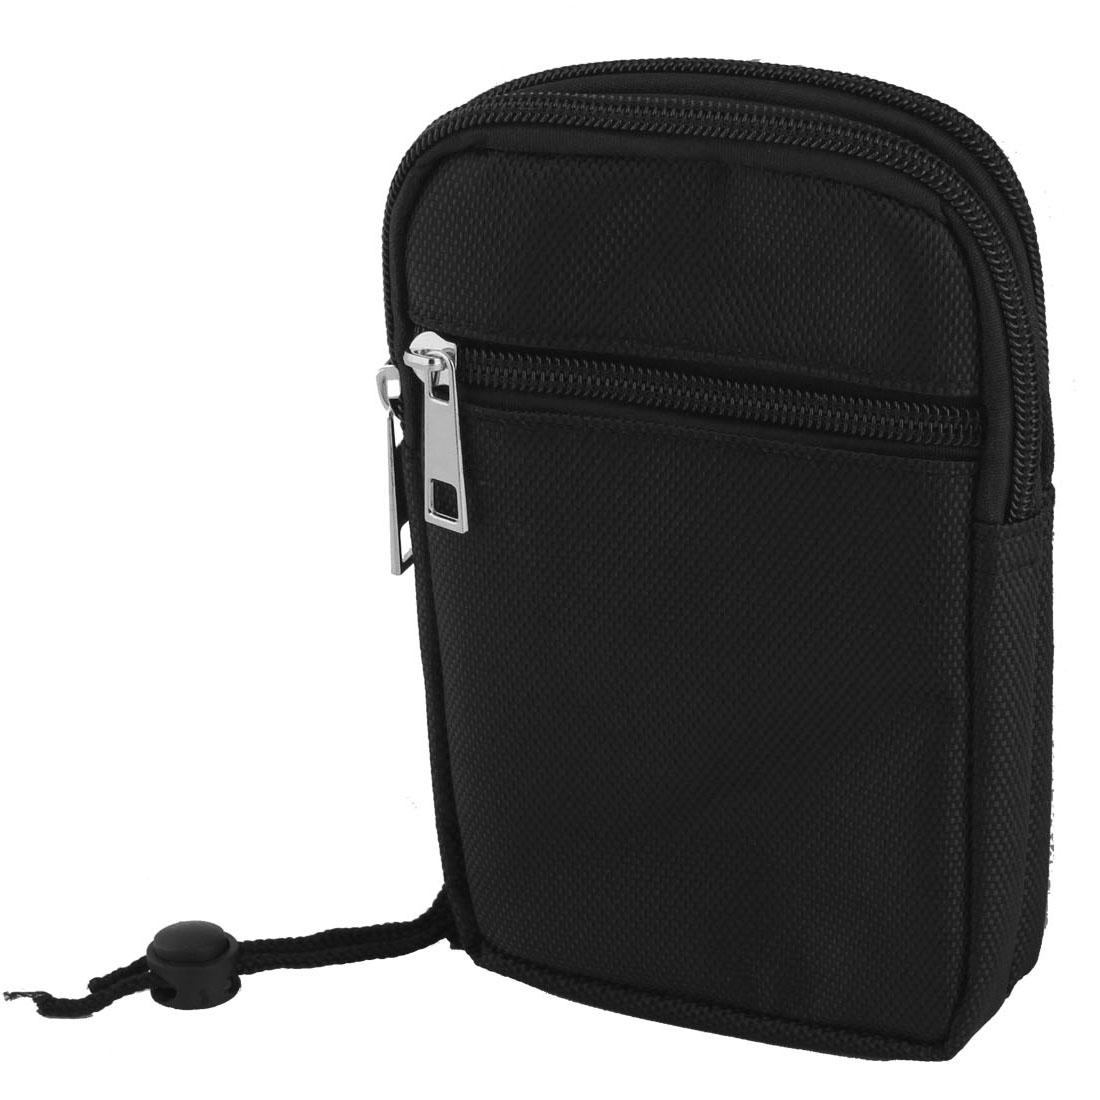 Man Phone Wallet Card Portable Holder Three Pockets Waist Bag Case Black